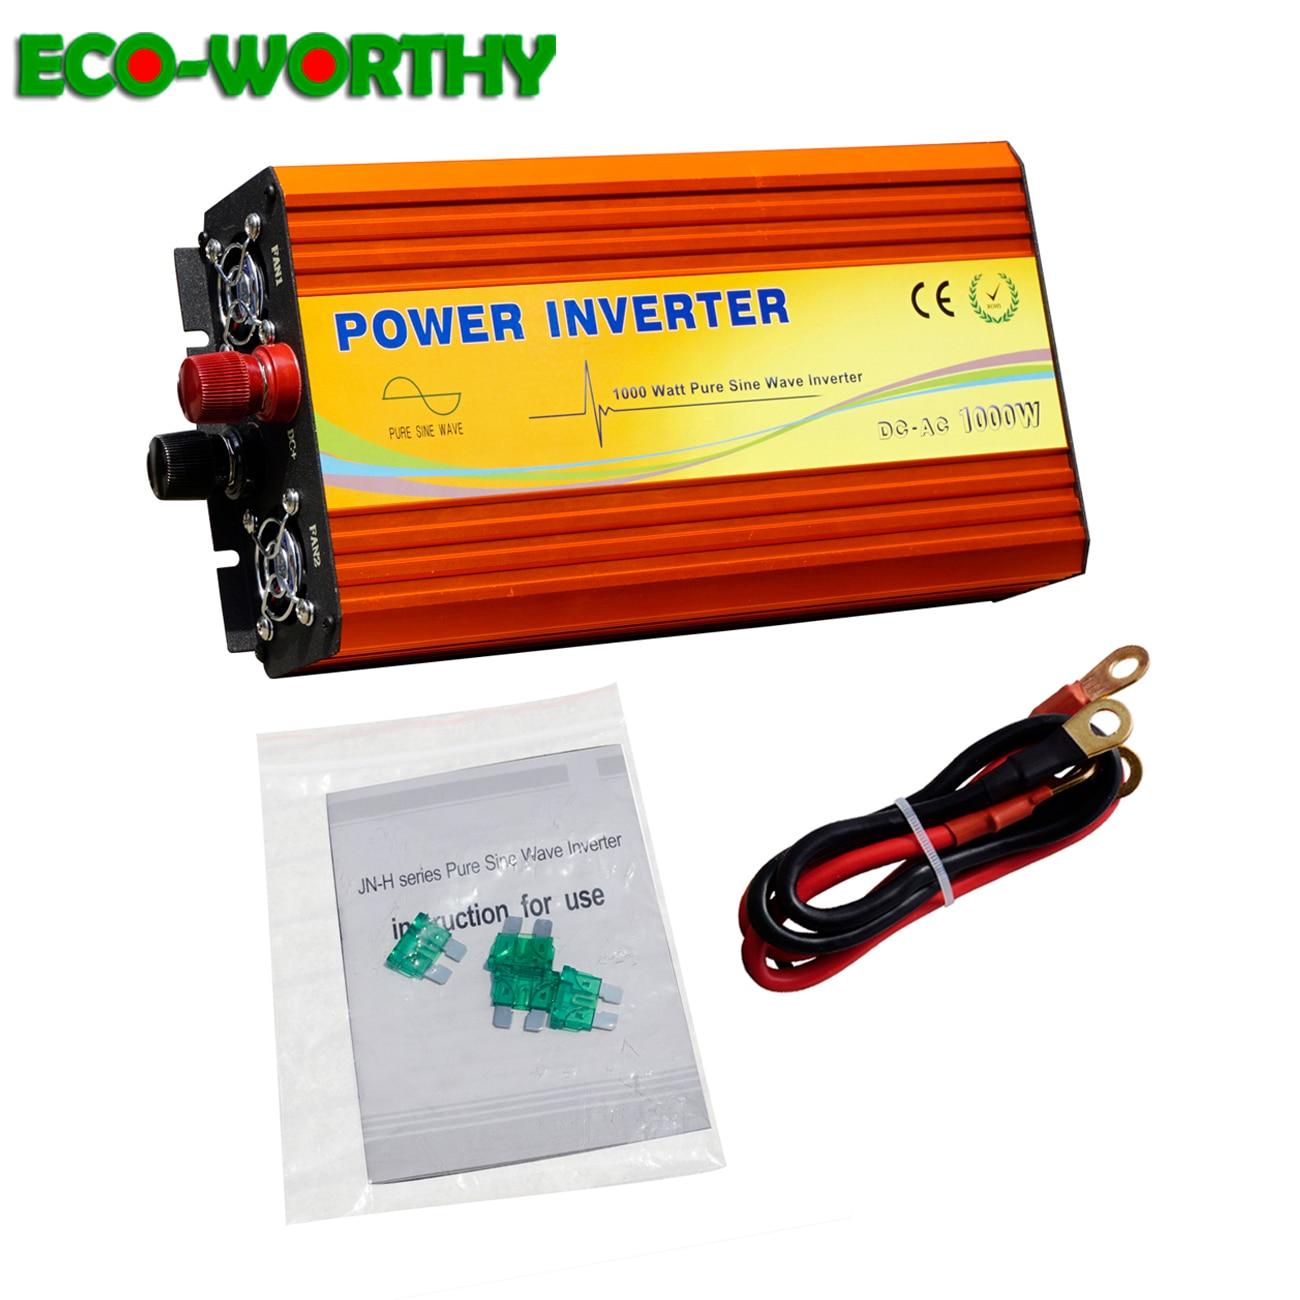 ECO-WORTHY 3KW 3000W 12V DC to 220V Pure Sine Wave Off Grid Inverter Converter for RV Boat